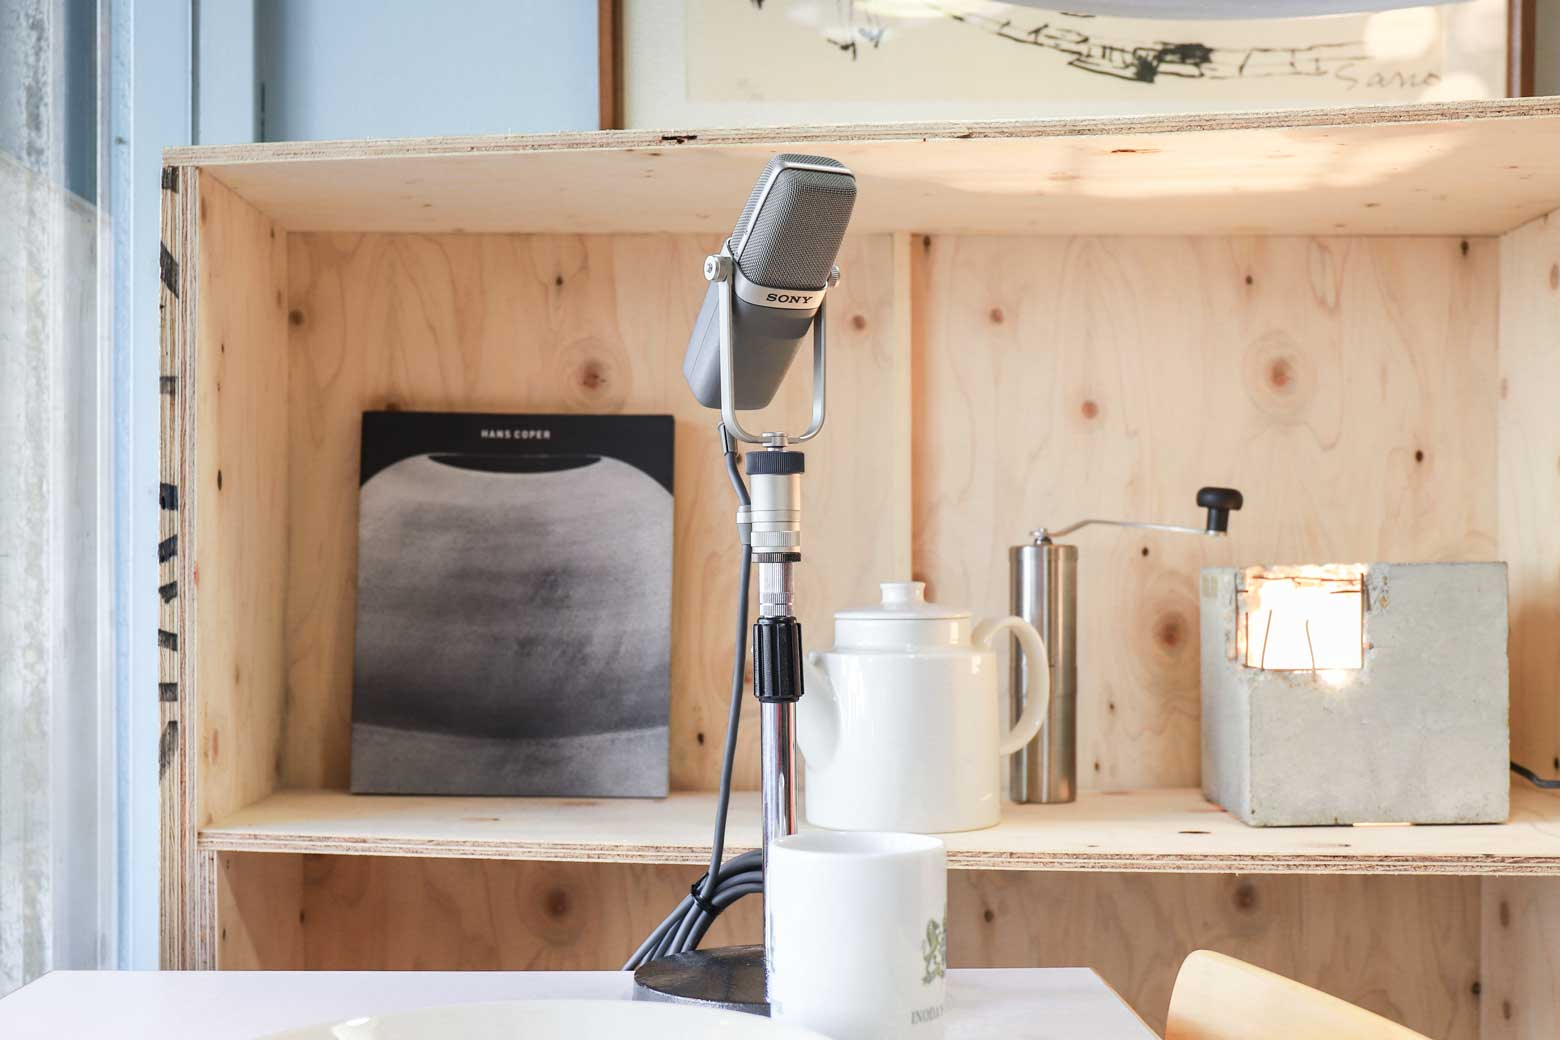 SONY Condenser Microphone C-38B/ソニー コンデンサー マイクロフォン